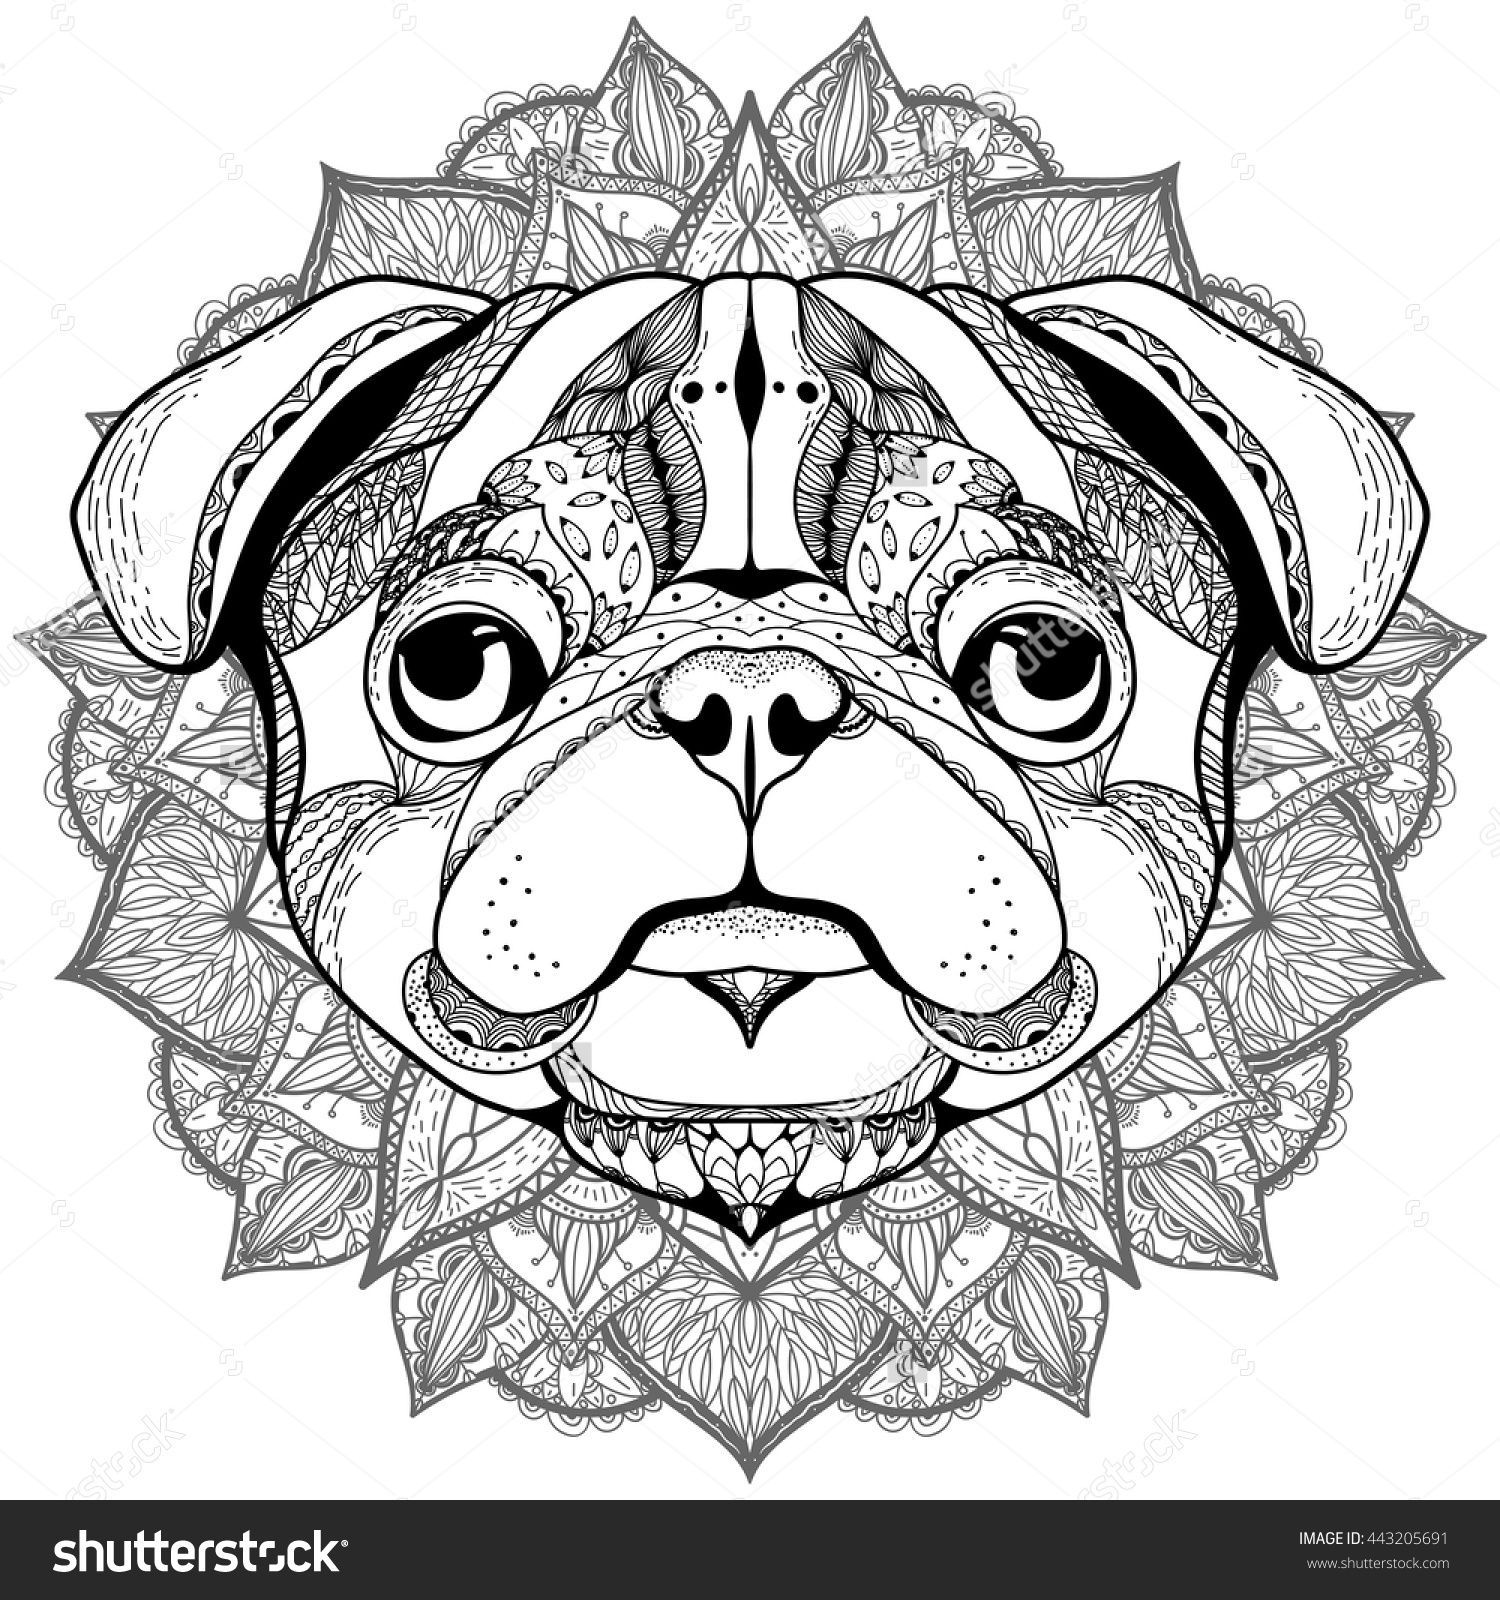 Zentangle Stylized Cartoon Of Pug Hand Drawn Sketch For